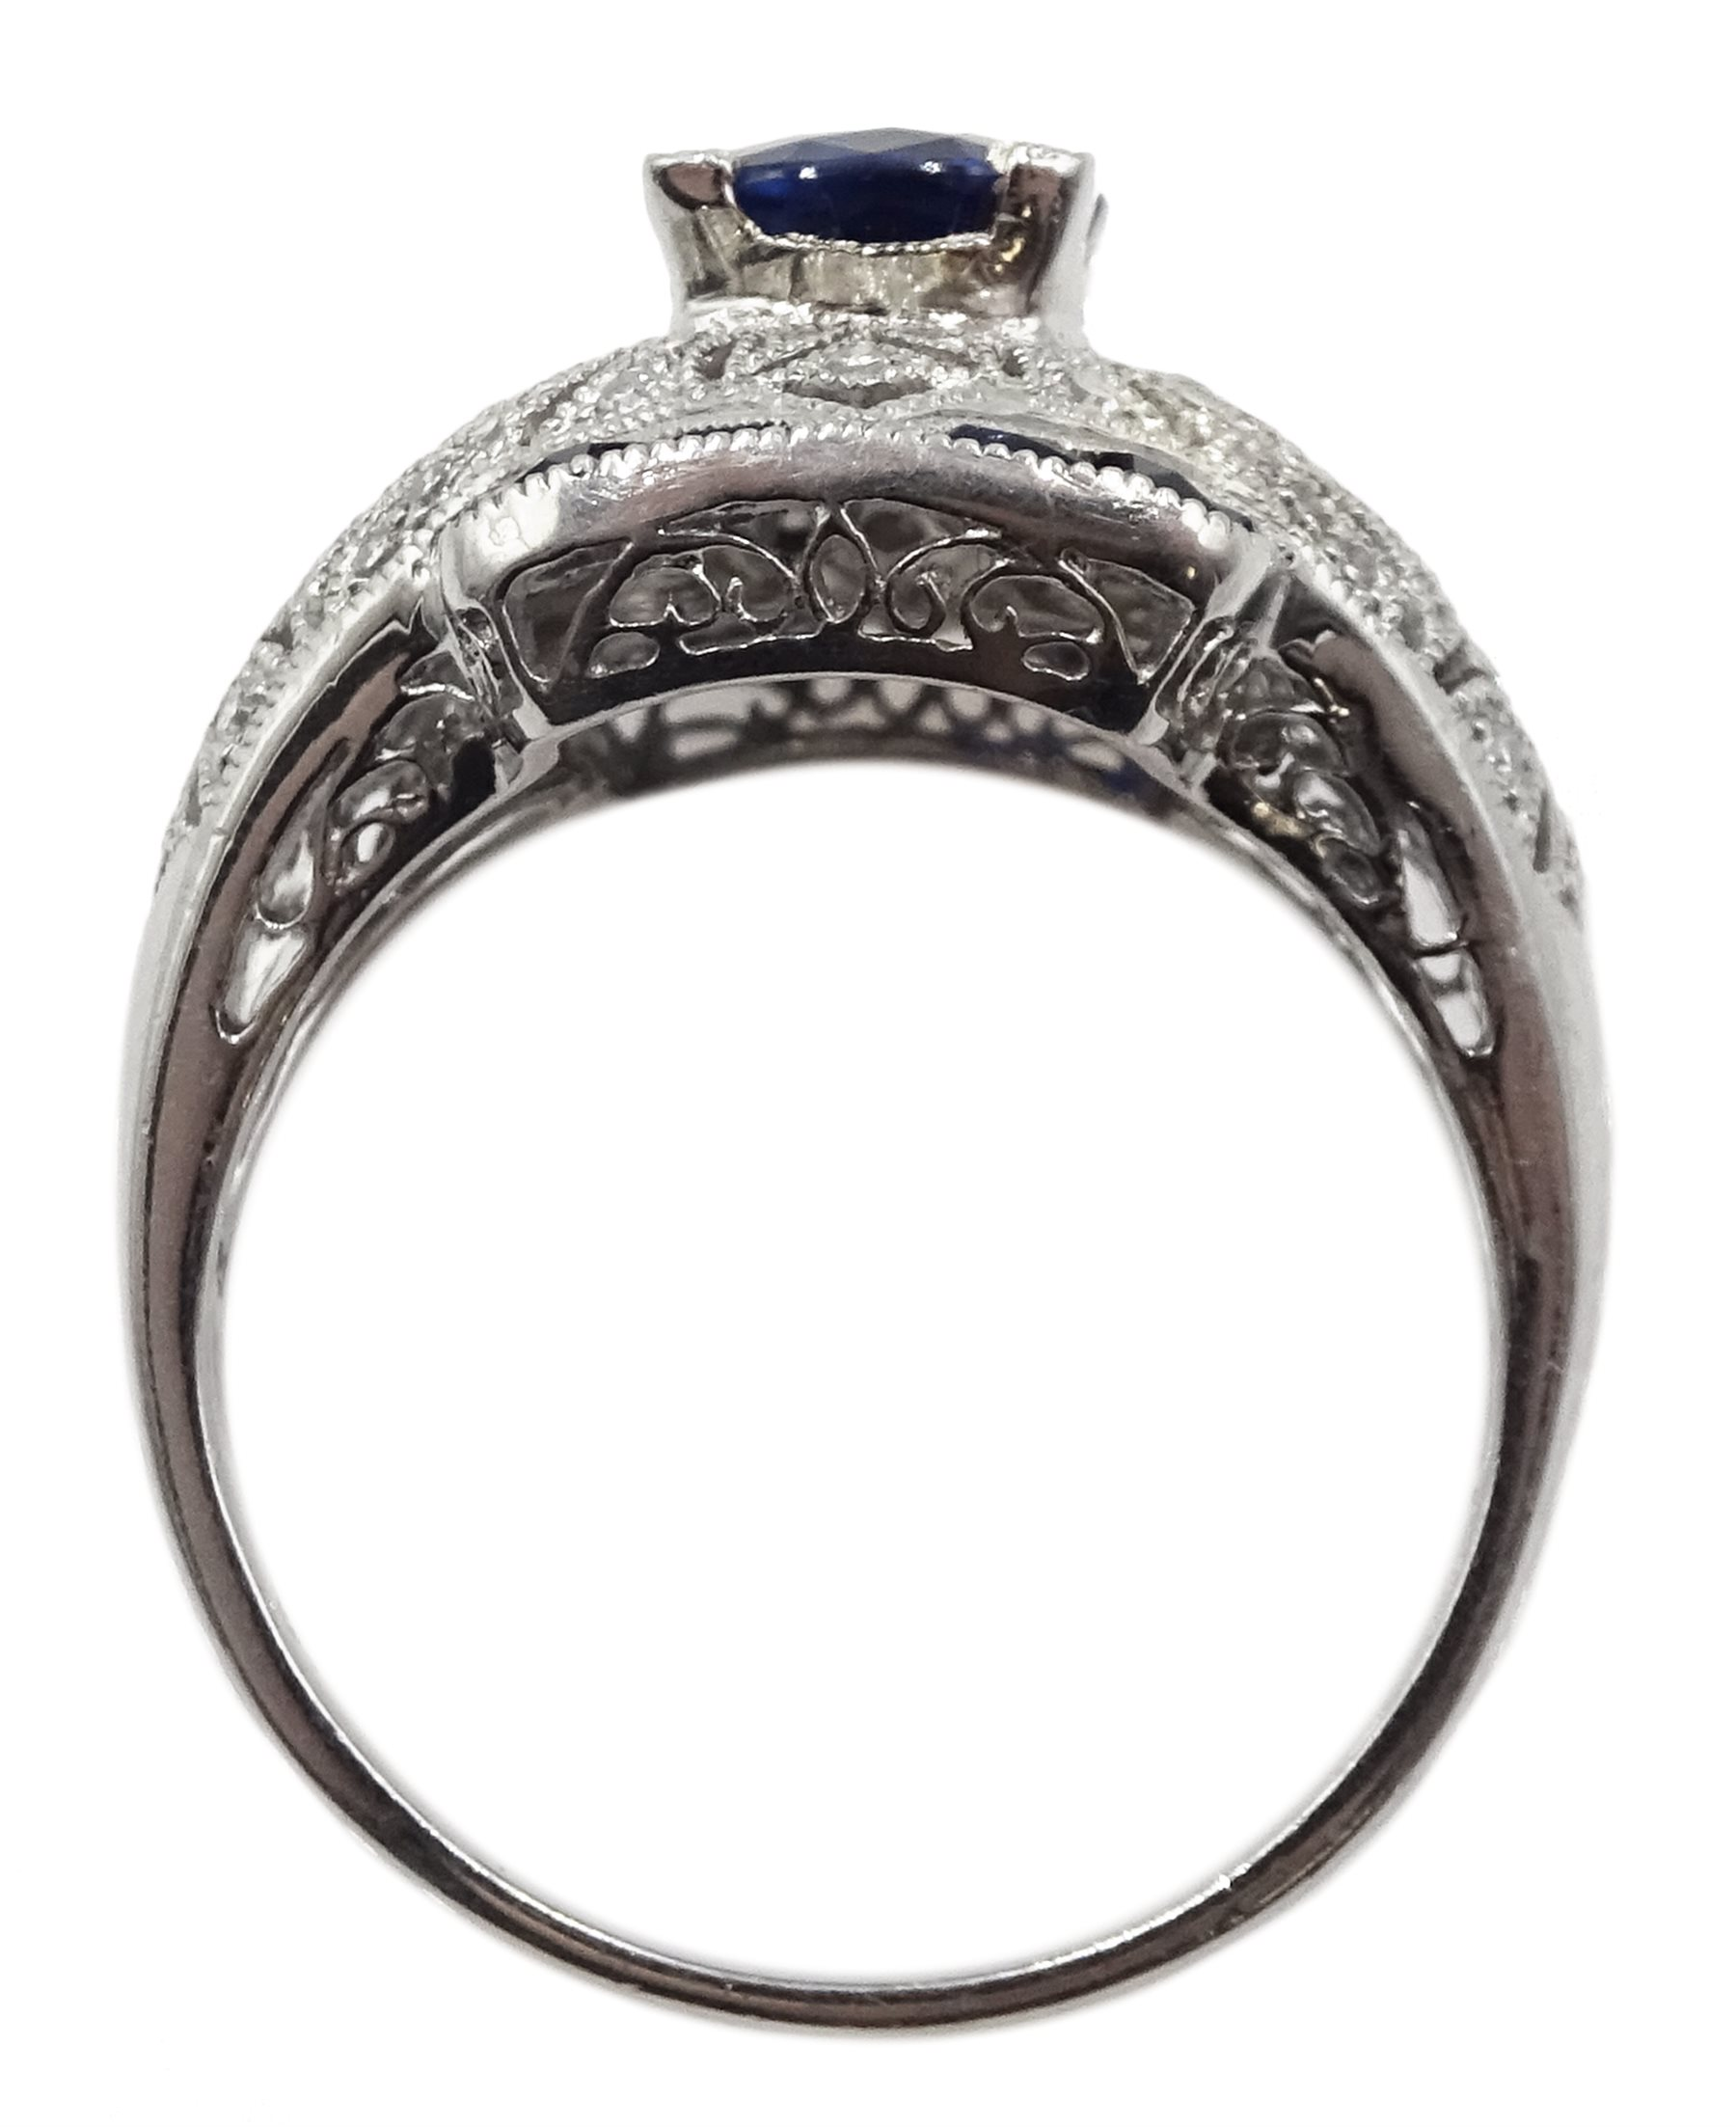 Platinum sapphire and diamond dress ring - Image 6 of 6